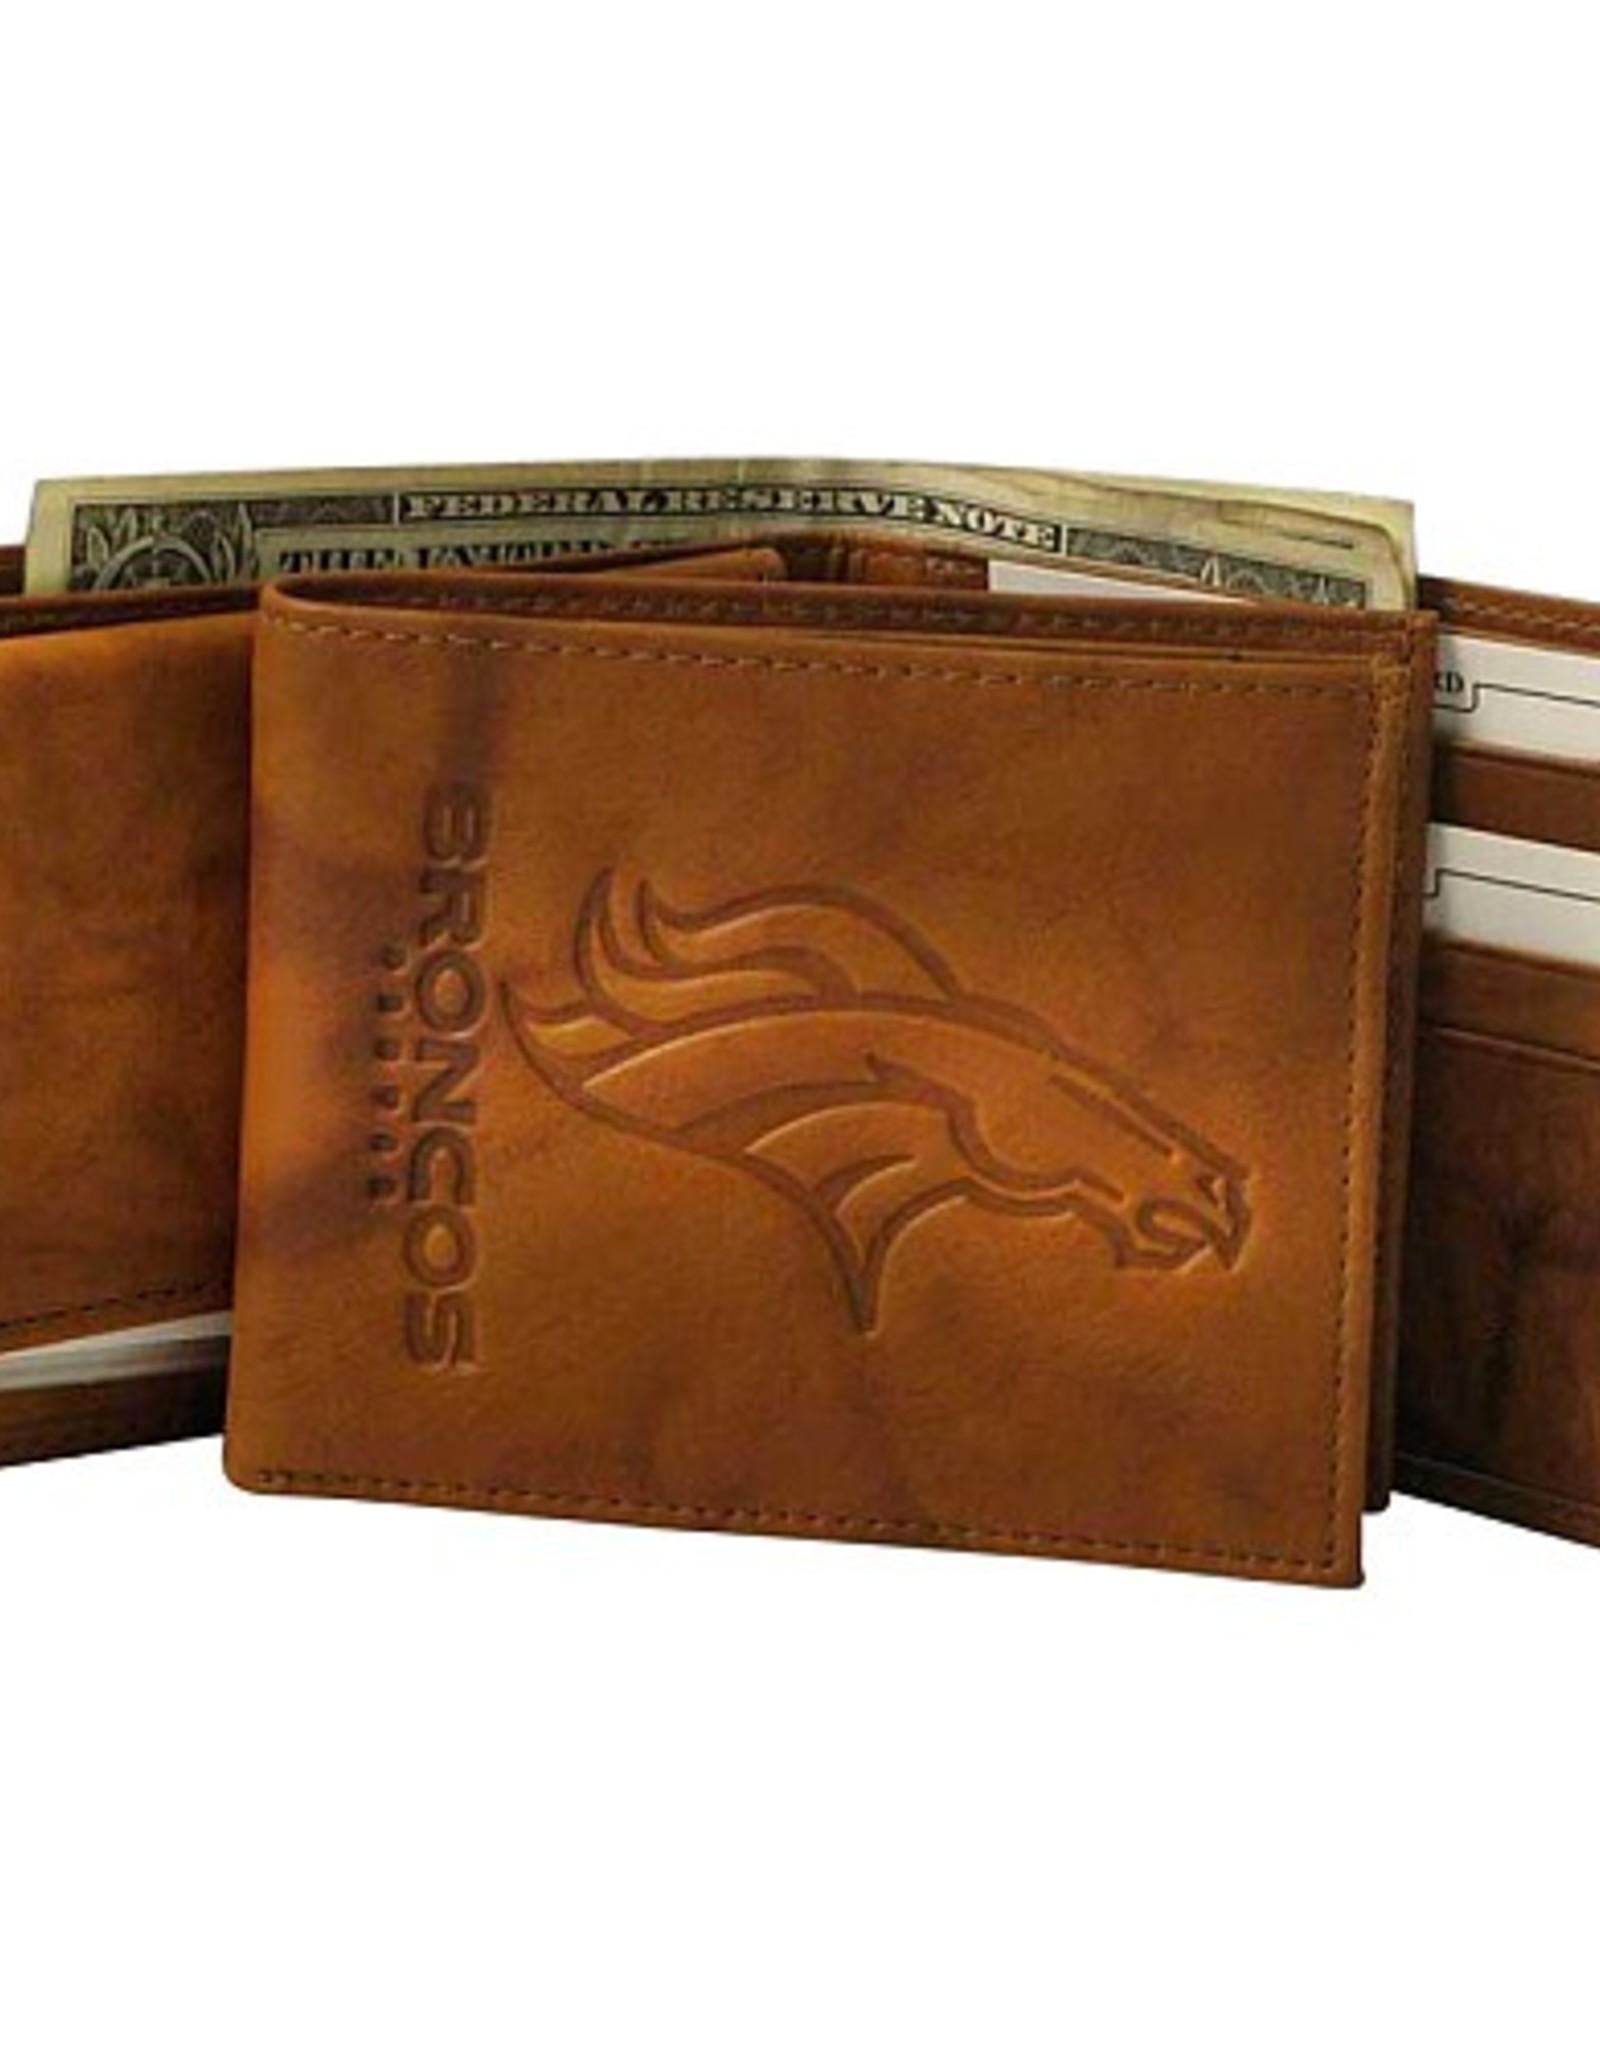 RICO INDUSTRIES Denver Broncos Genuine Leather Vintage Billfold Wallet